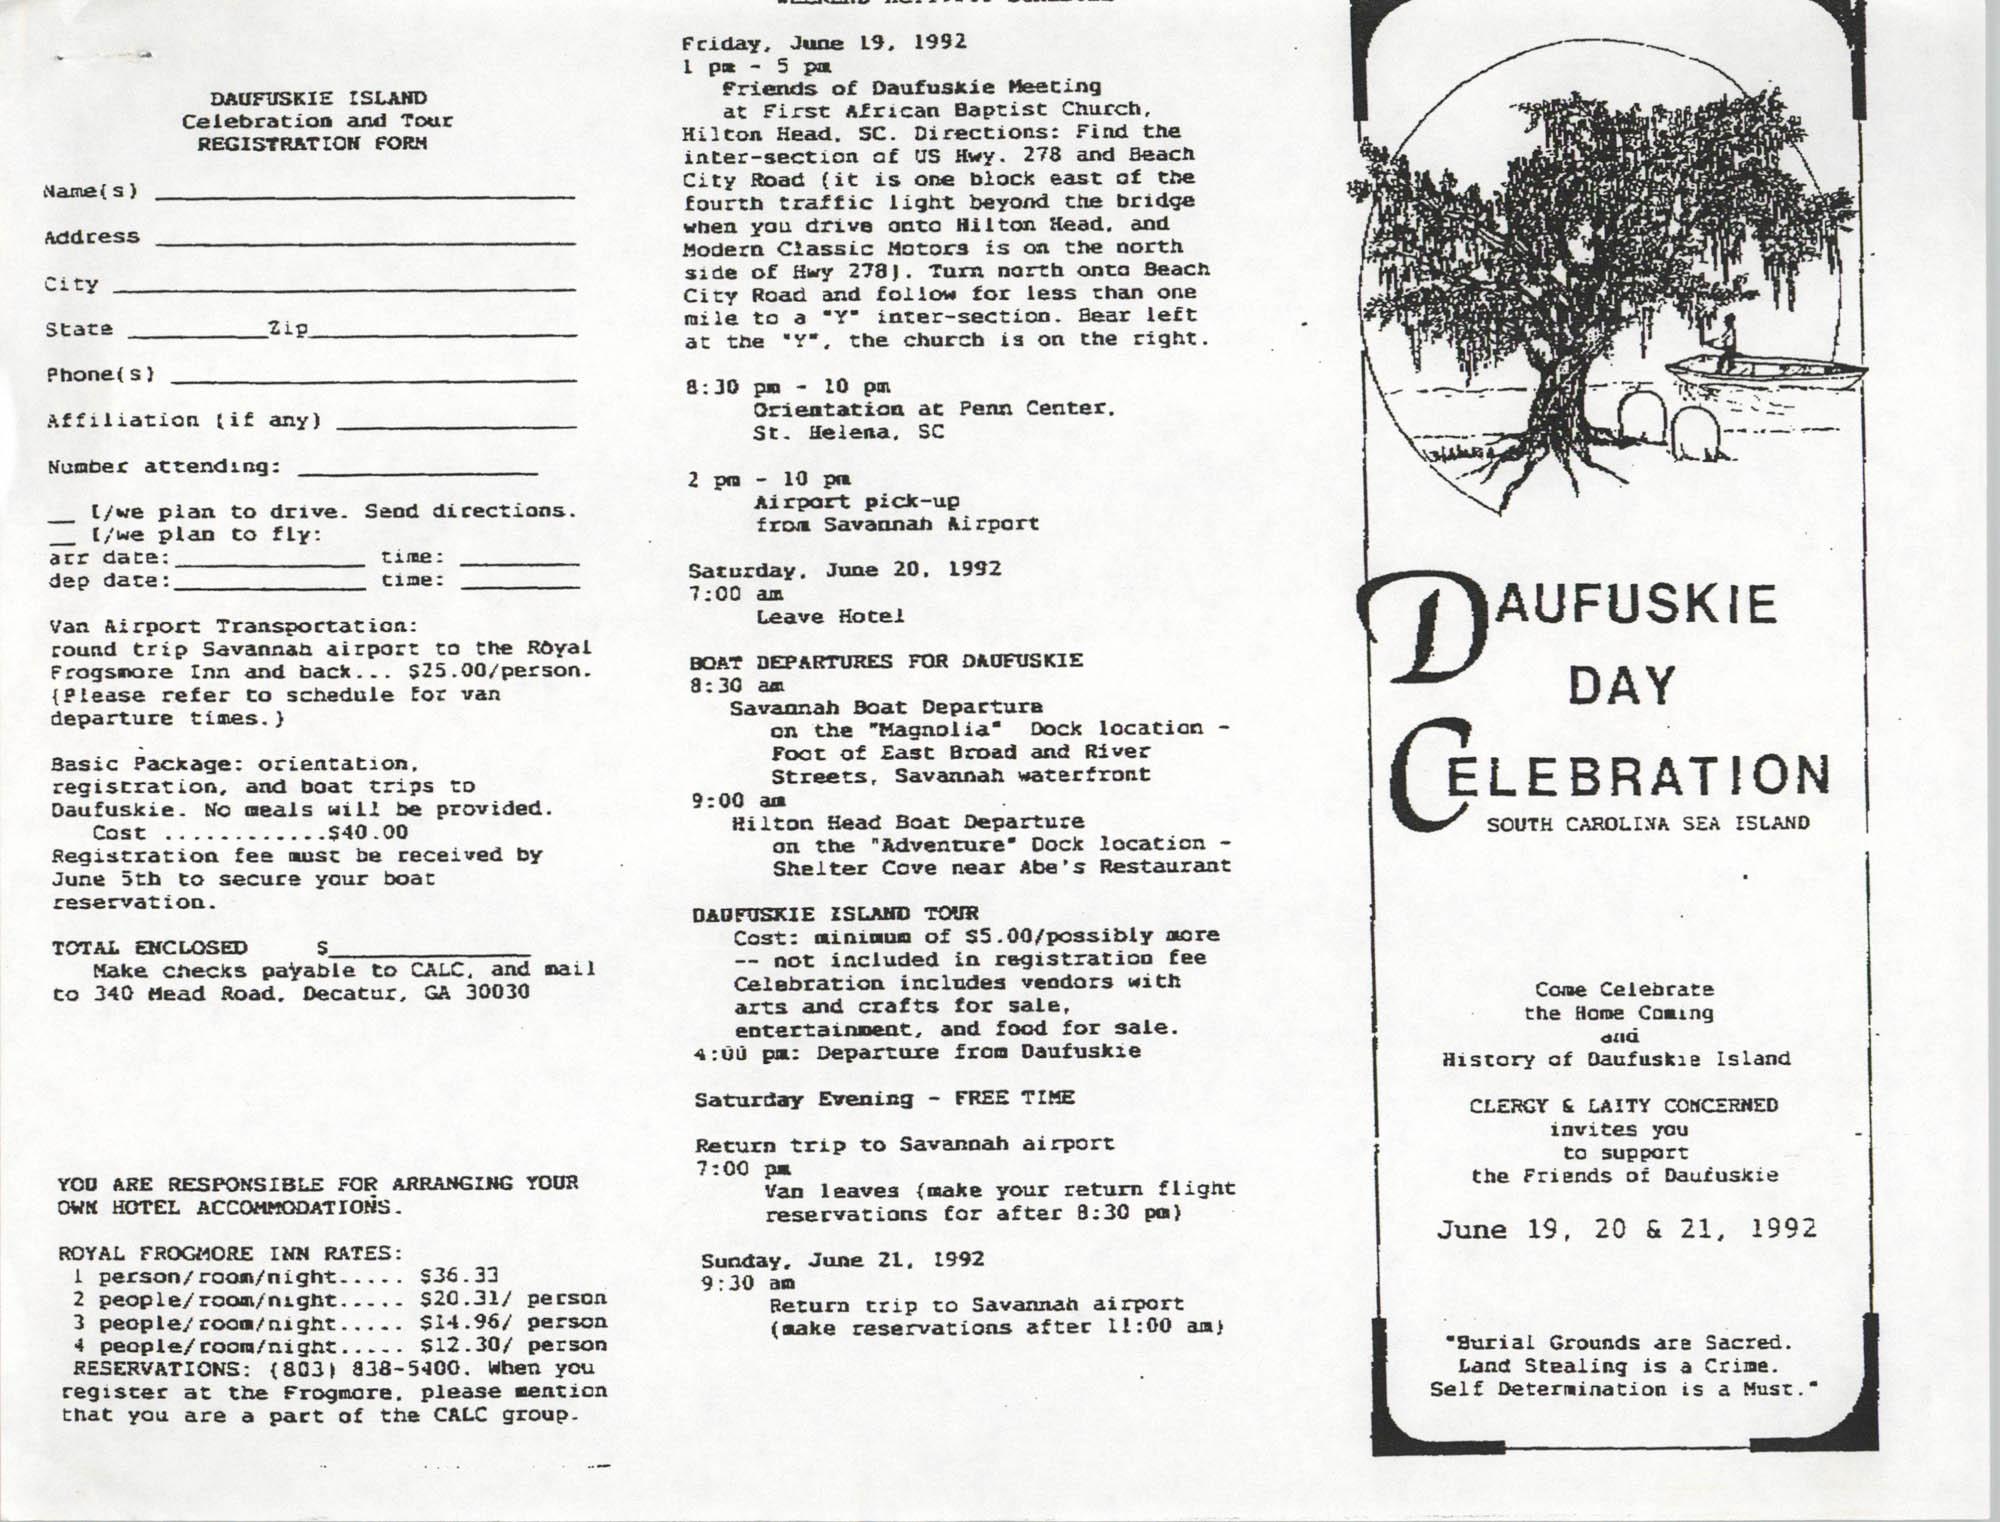 Daufuskie Day Celebration Pamphlet, Page 1